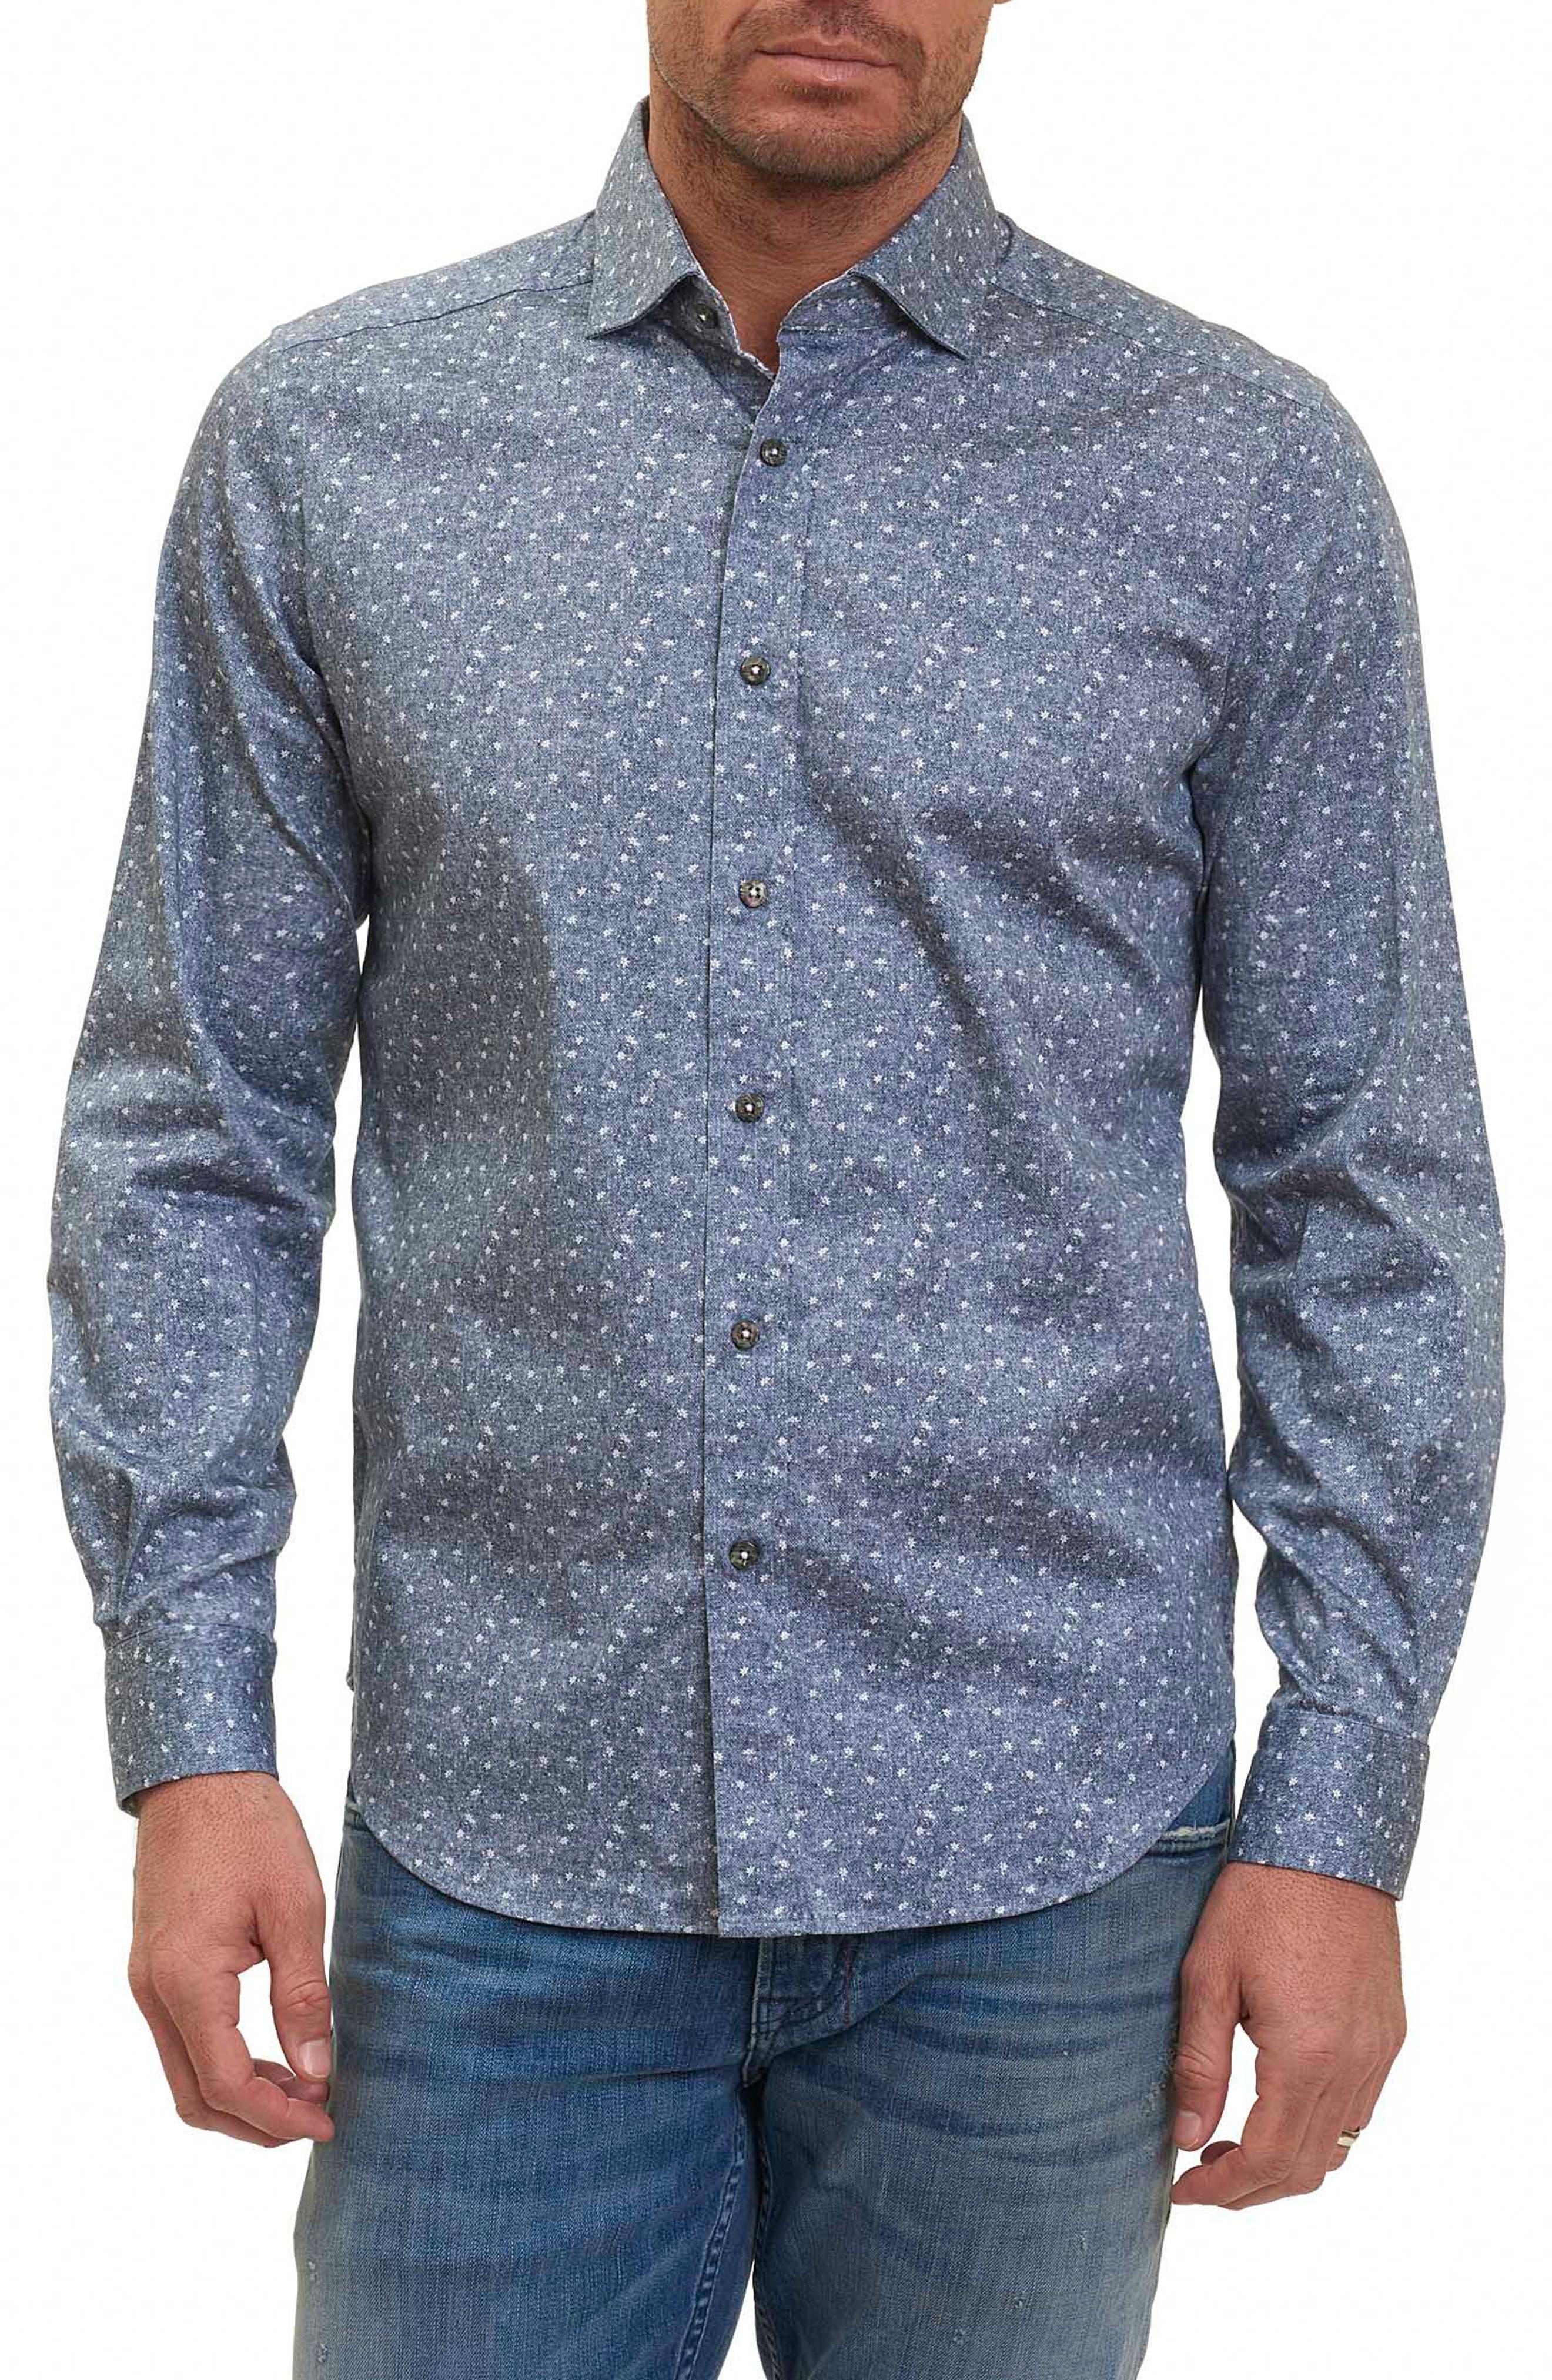 Zander Tailored Fit Sport Shirt,                             Main thumbnail 1, color,                             020